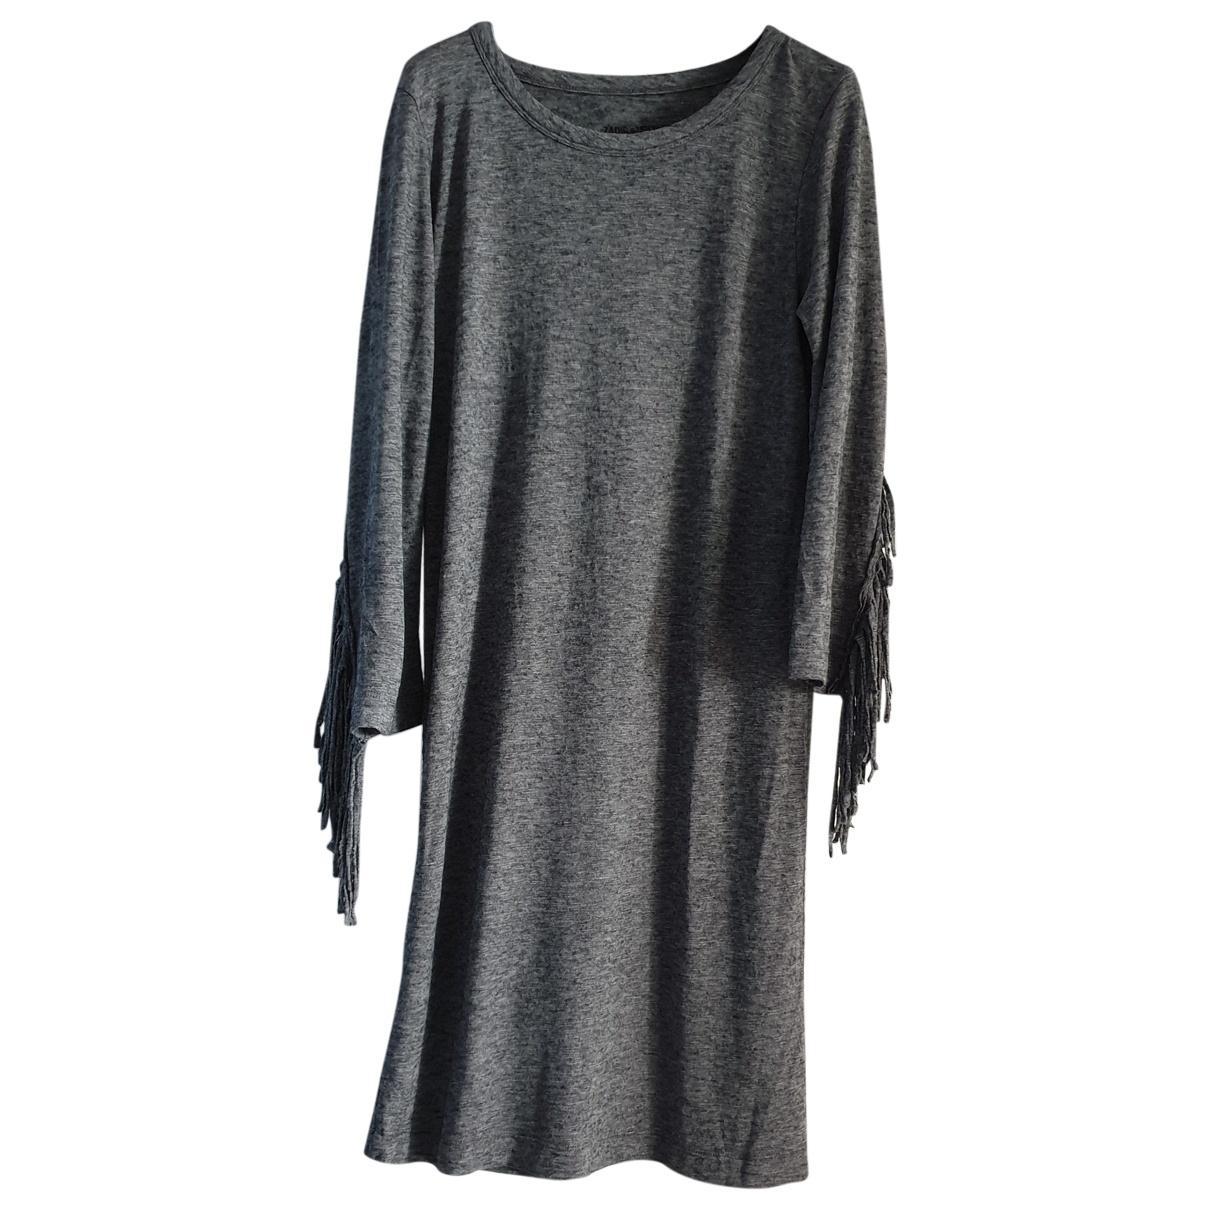 Zadig & Voltaire \N Grey dress for Women 34 FR